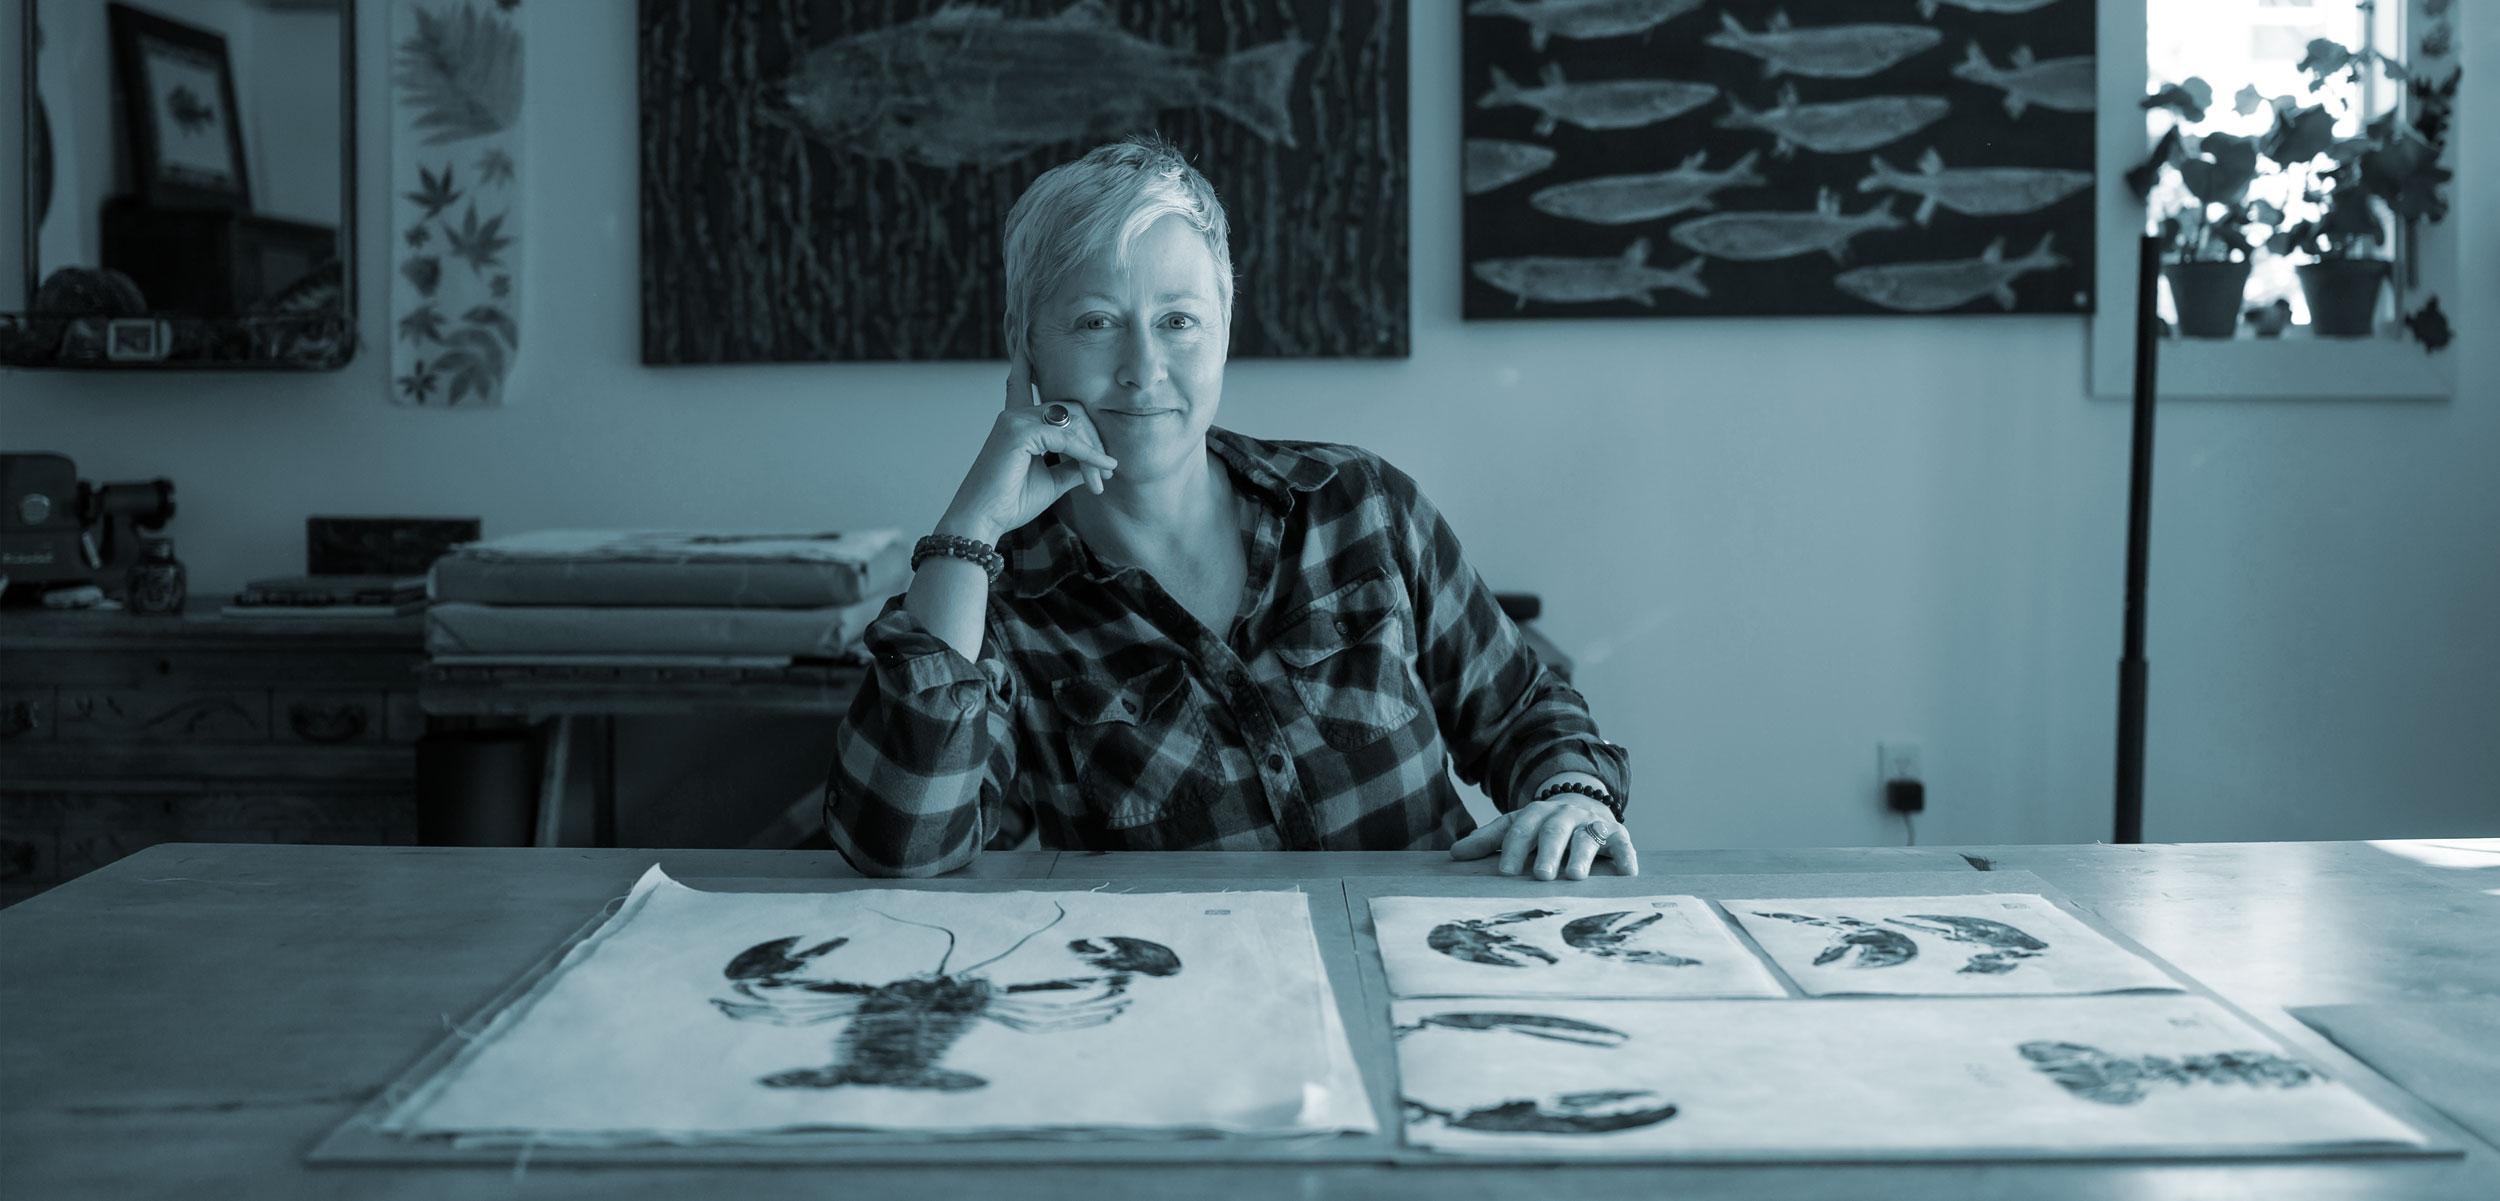 artist Rachel Reeve